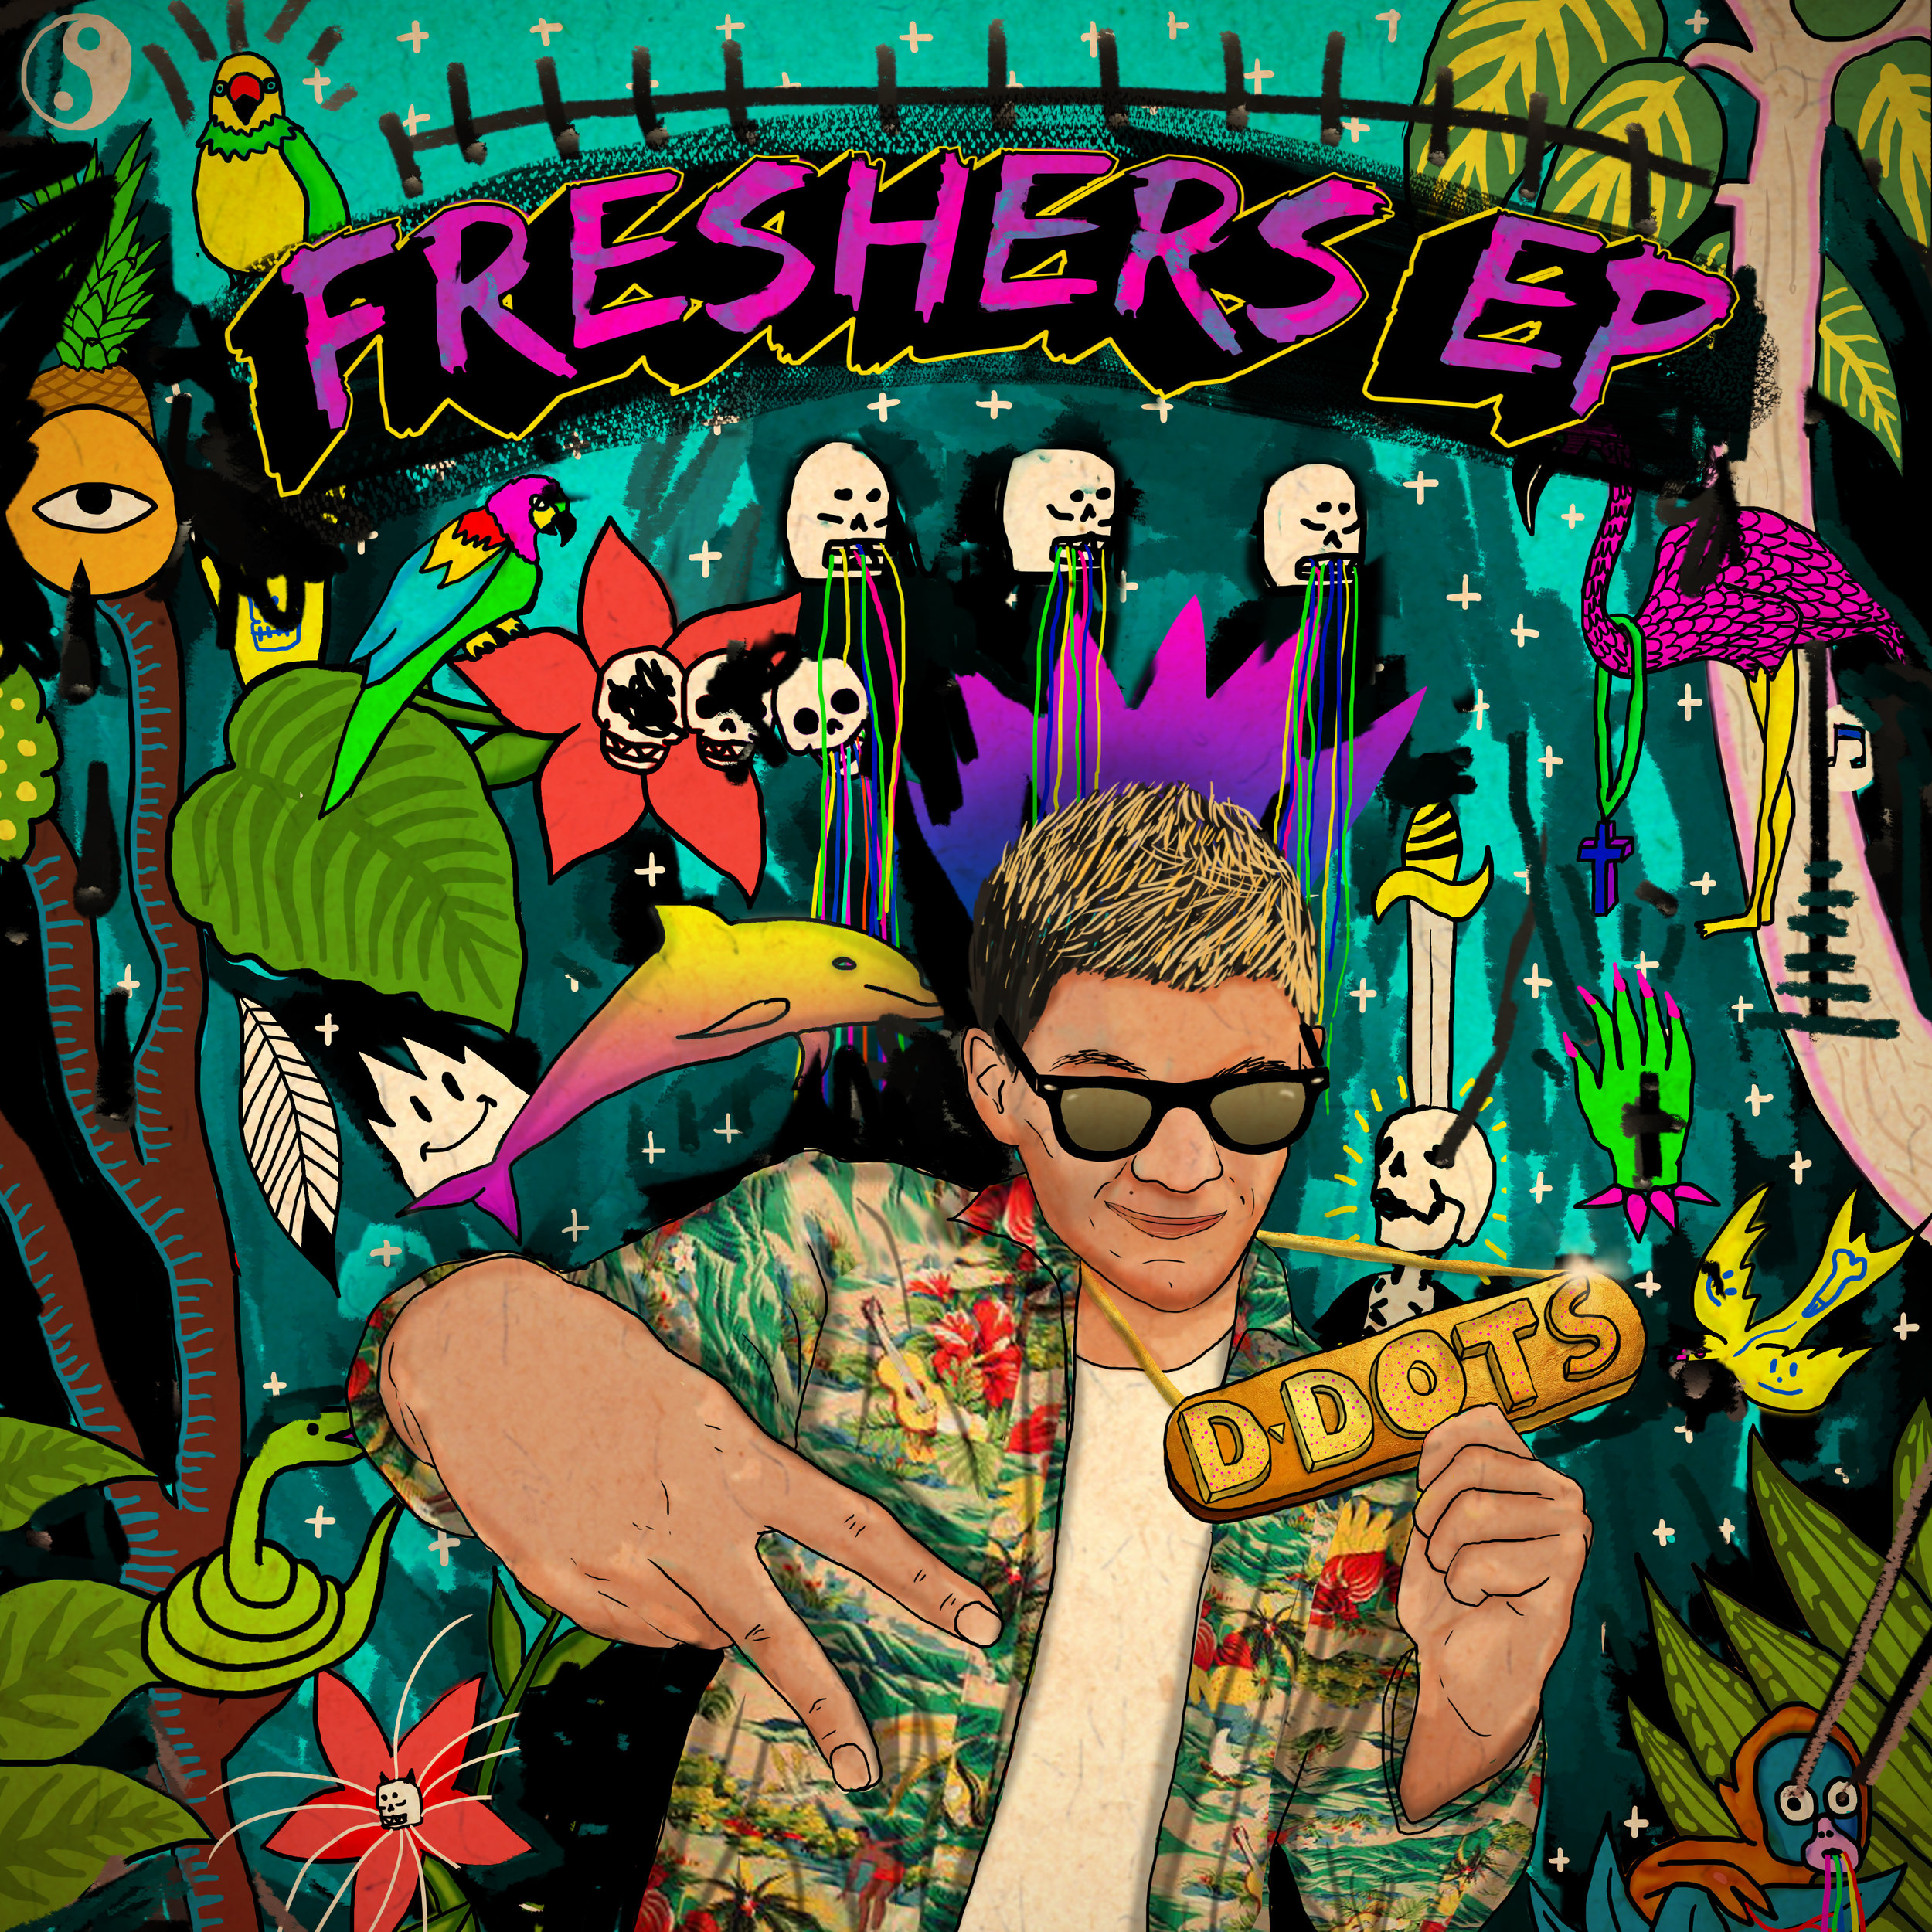 D-DOTs - Freshers EP Artwork.jpg